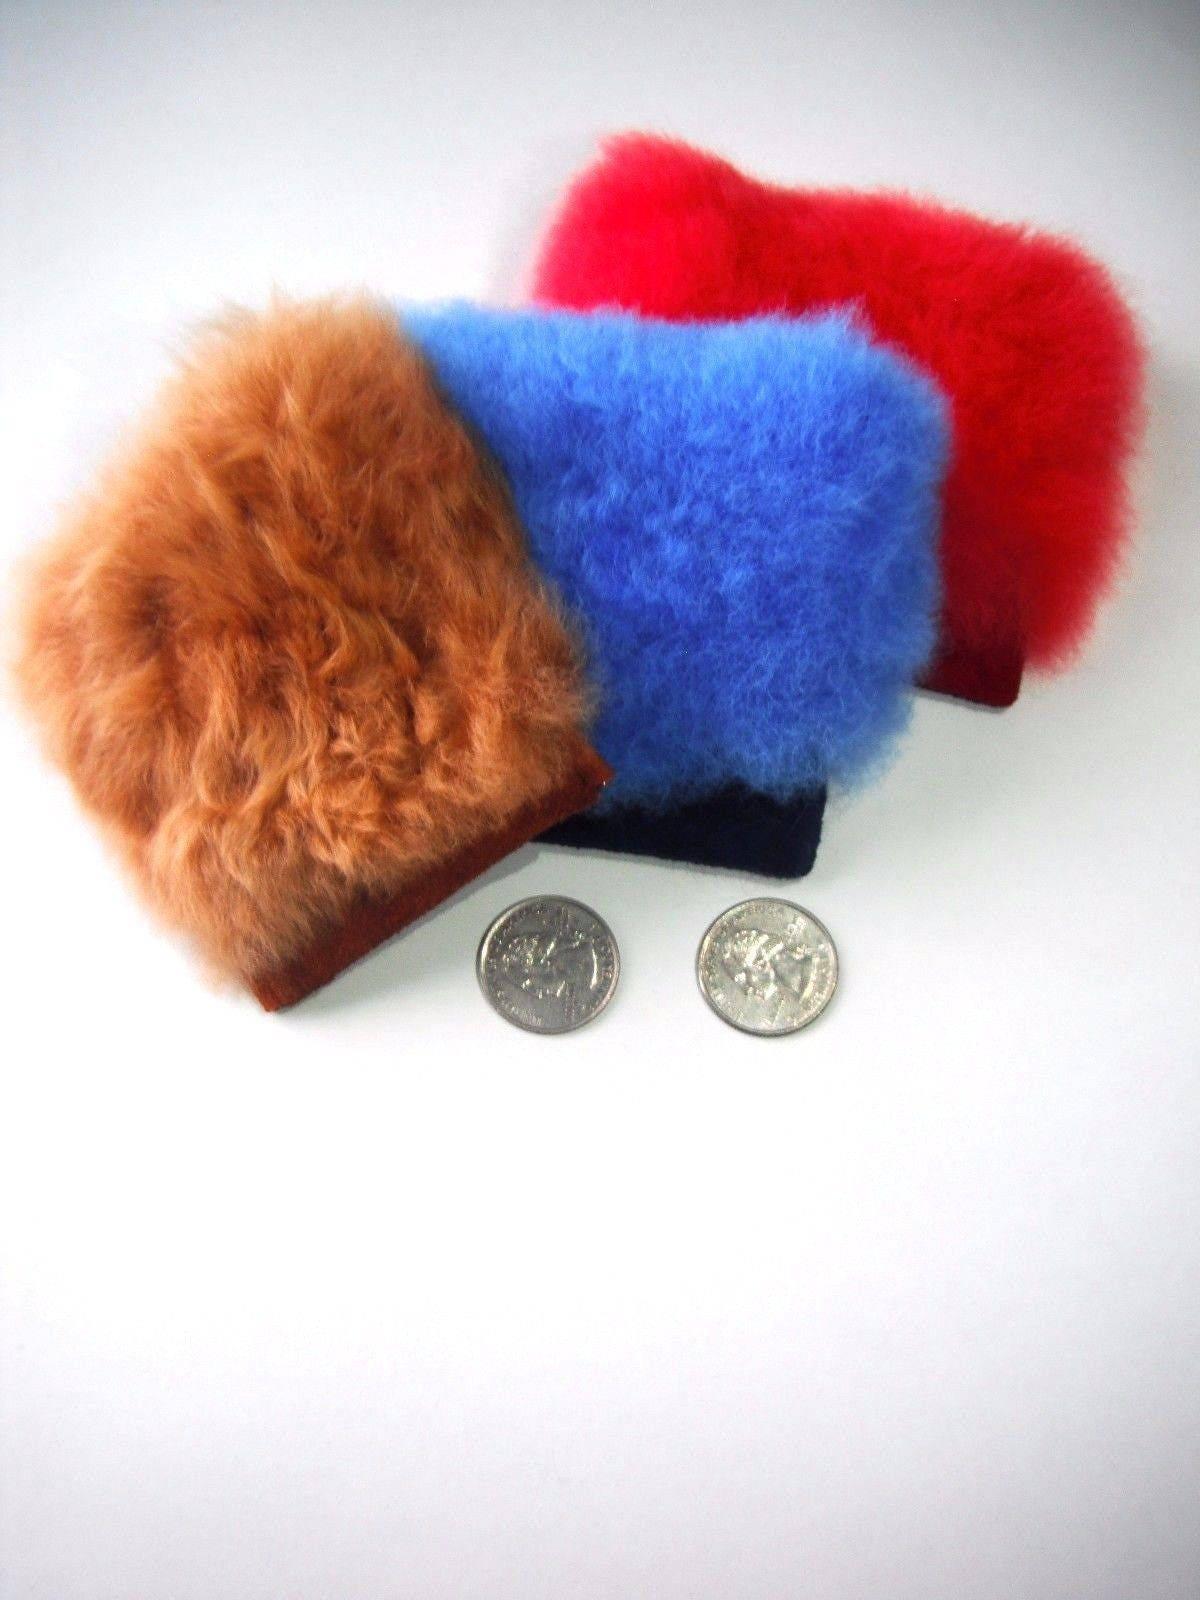 b60468e298fc1 3.8 Baby Alpaca Fur Coin Purse - no kill fur alpaca, coin purse, fur ...